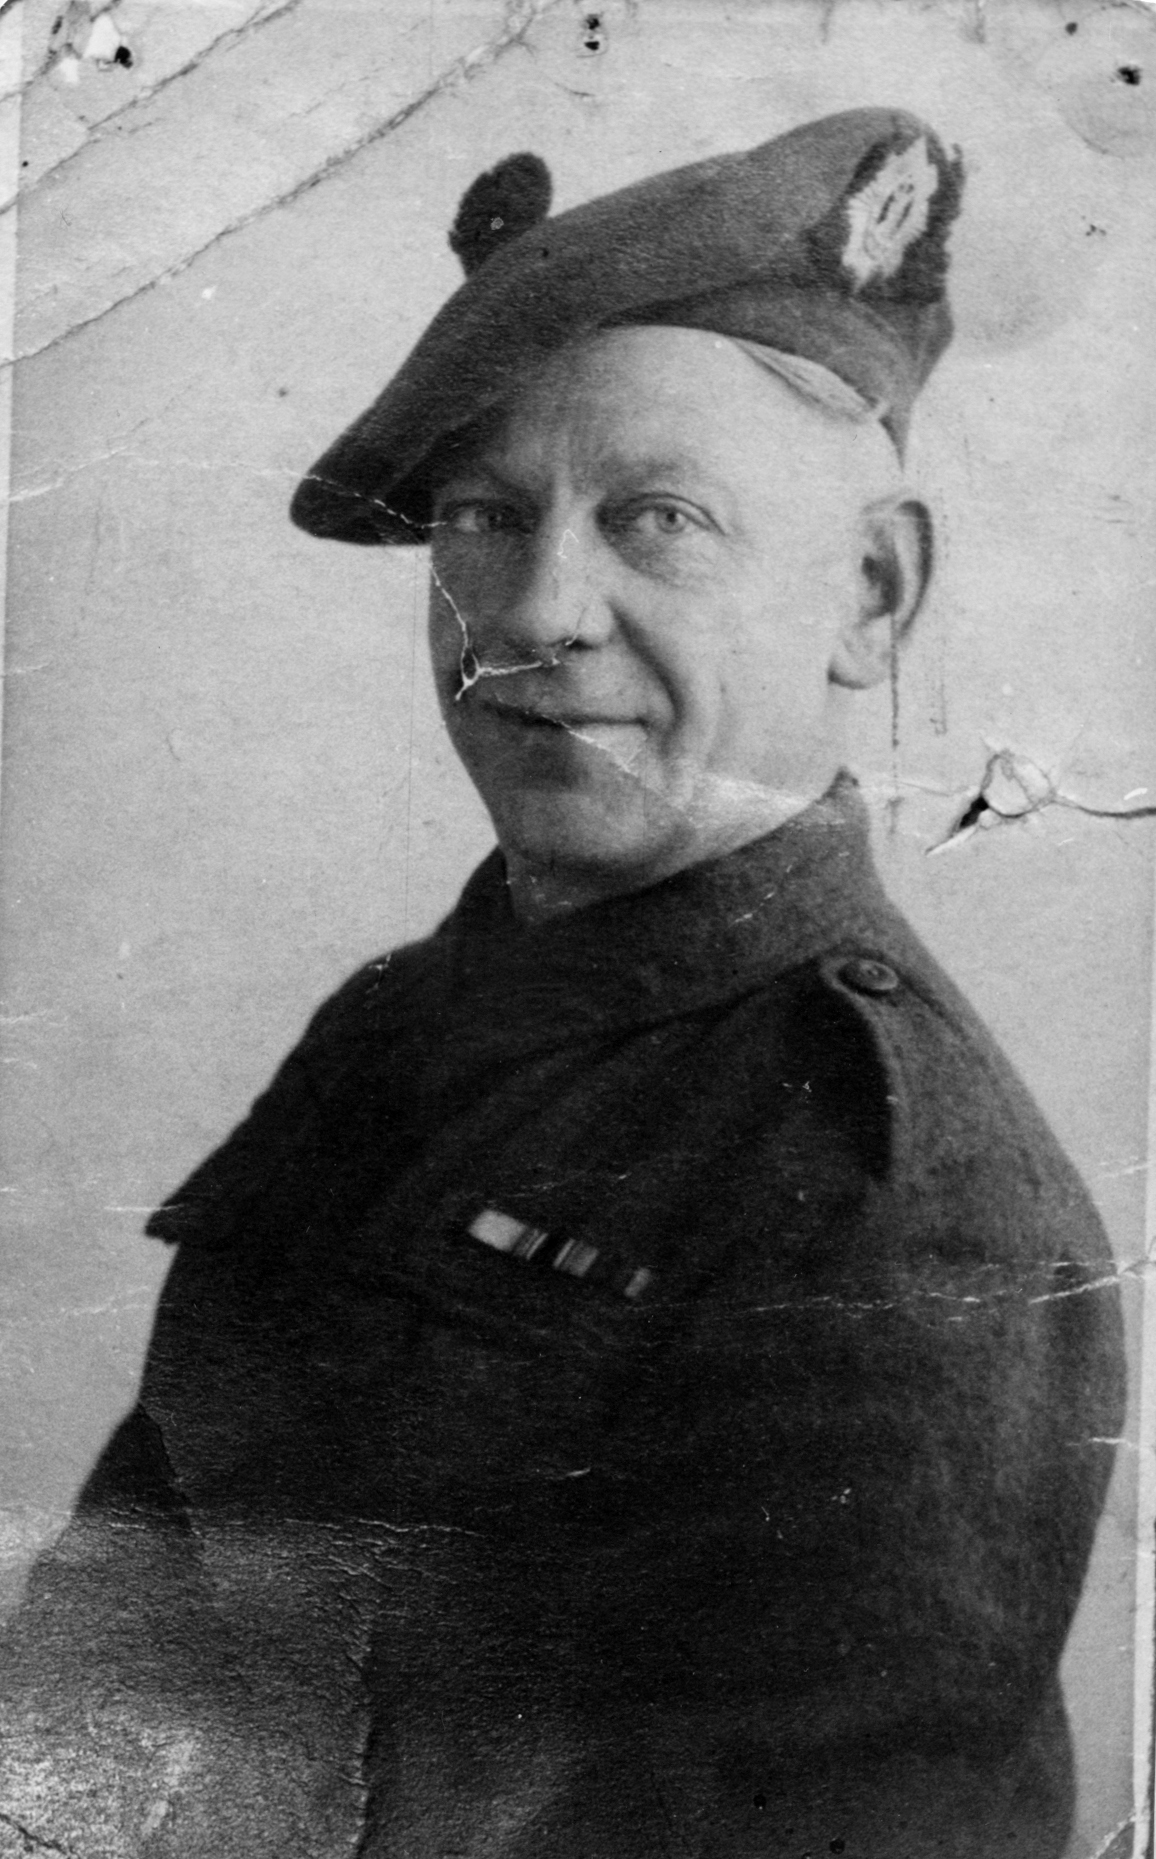 Portrait Soldier Of The Royal Scots 1939